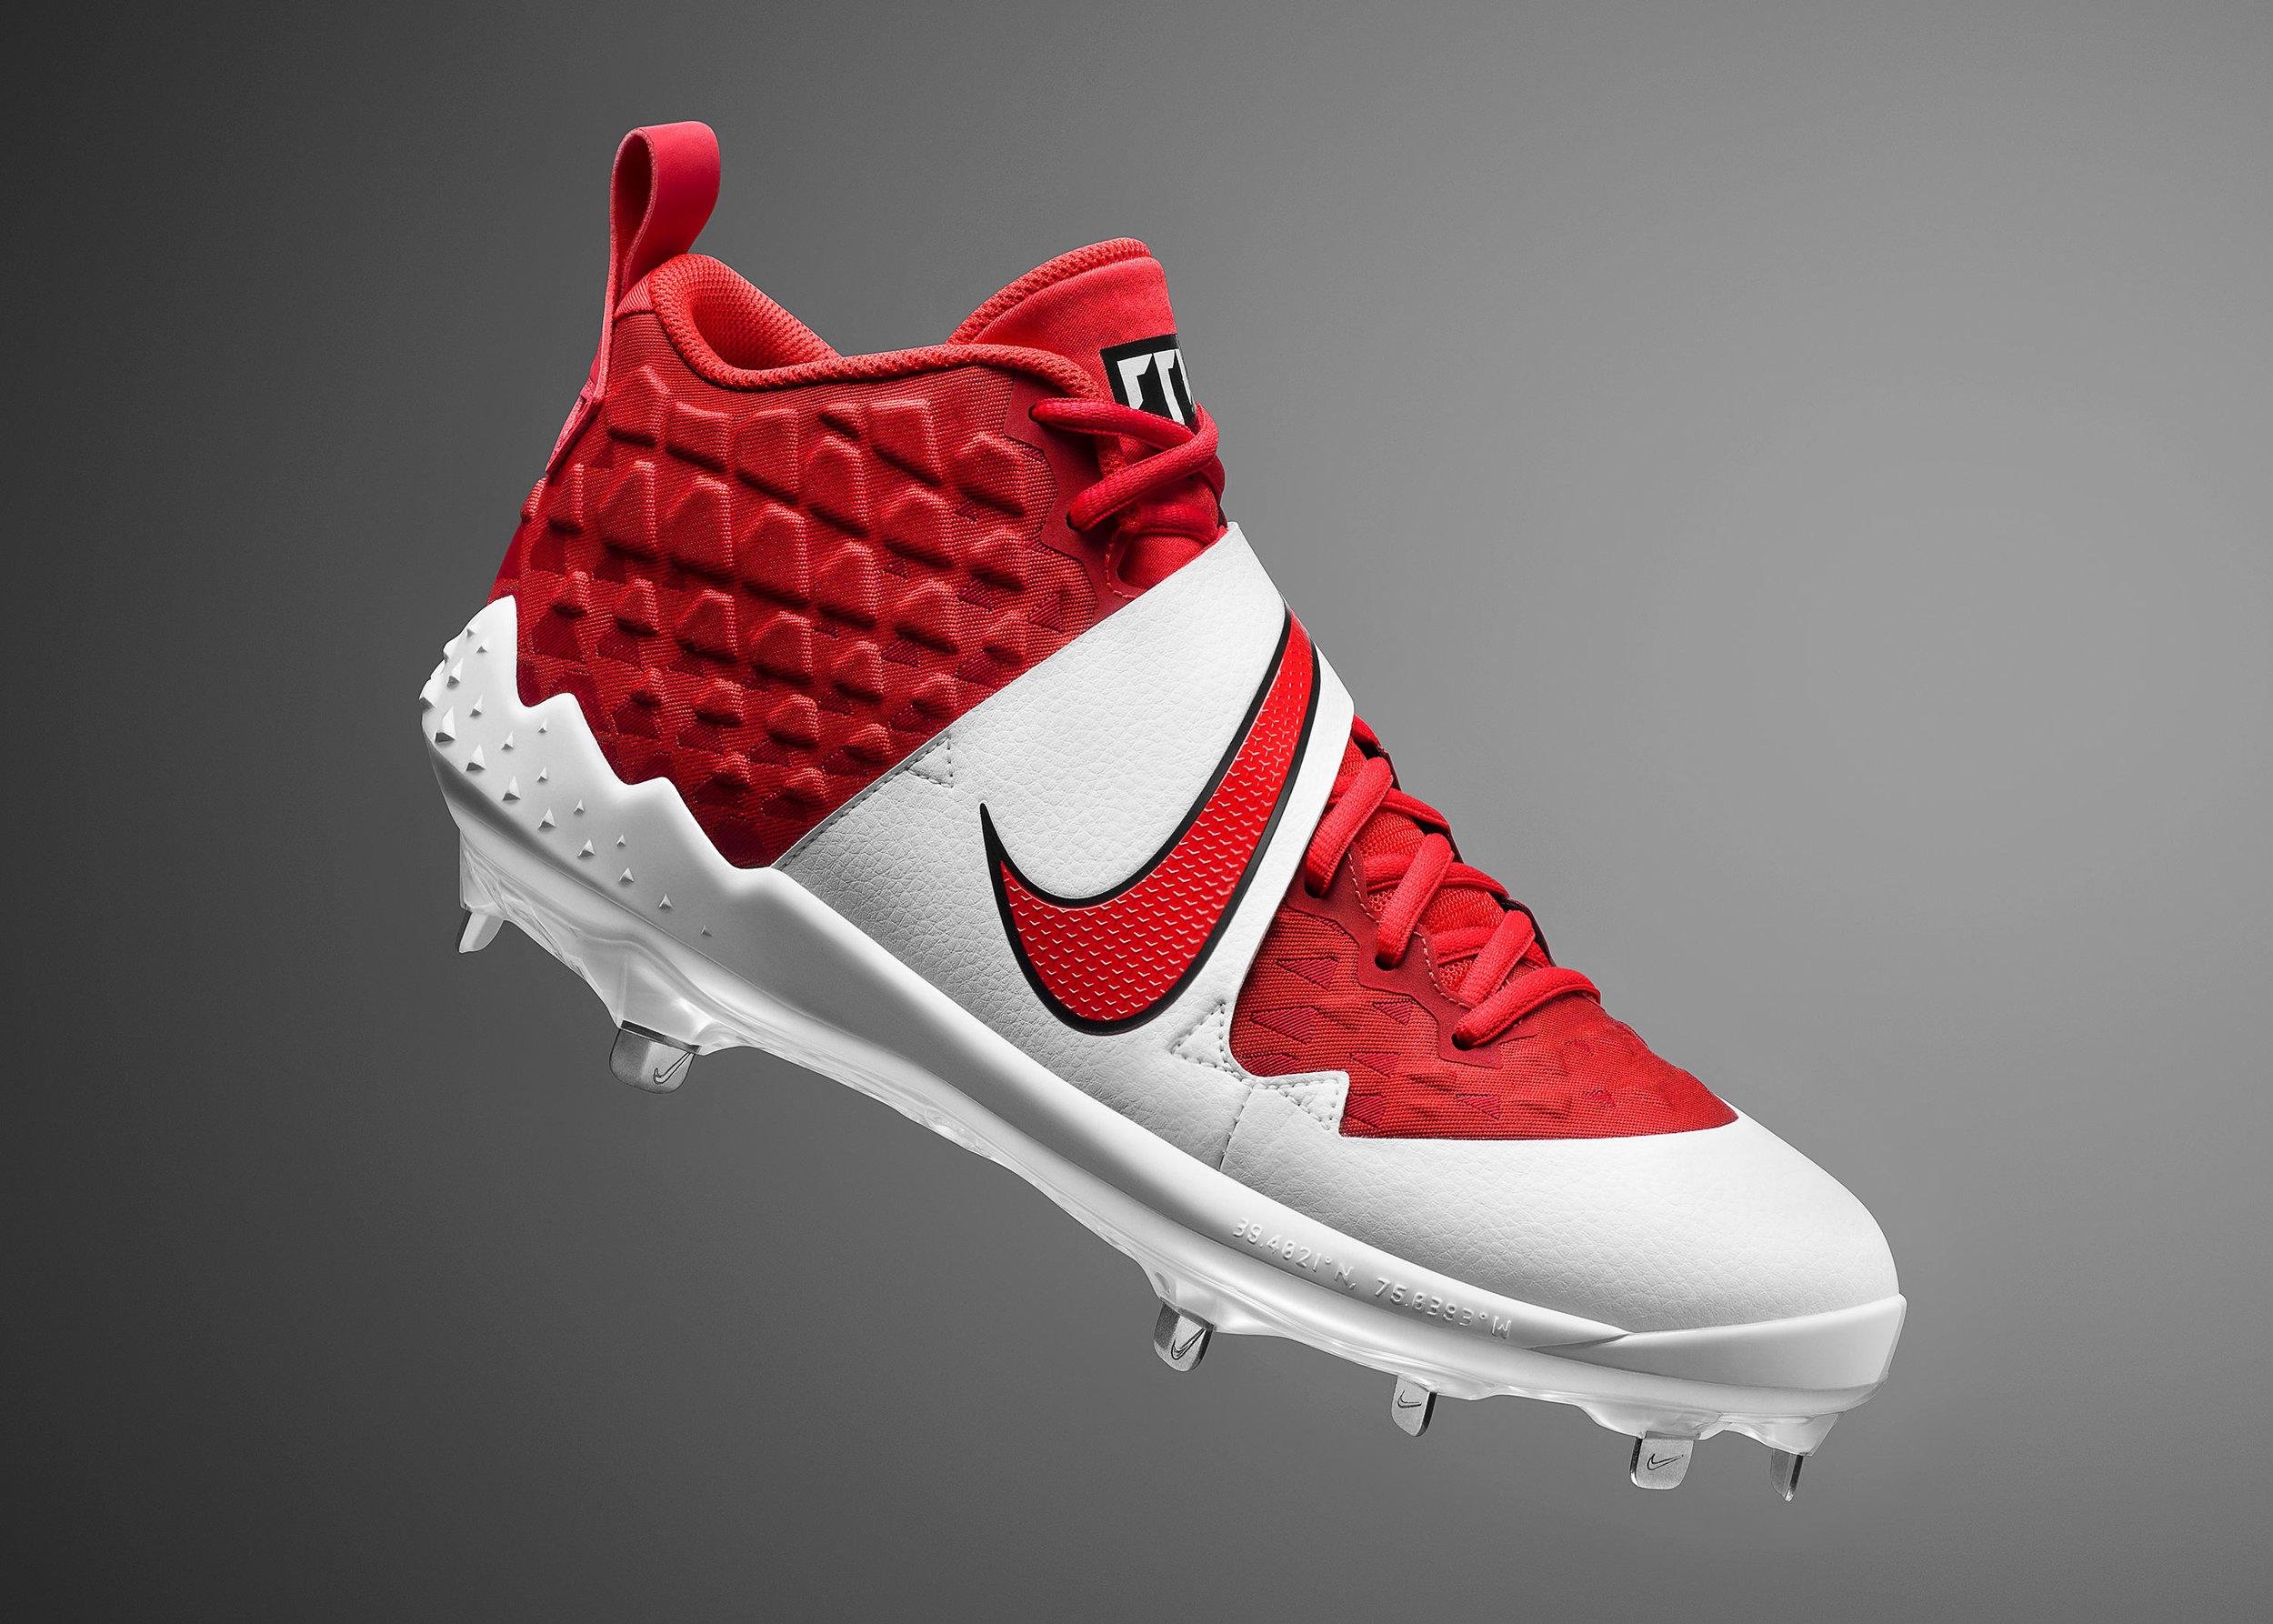 NikeNews_NikeZoomTrout6_Fa19_BSBL_Trout6_NA_Cleat_01_re_88995.jpg